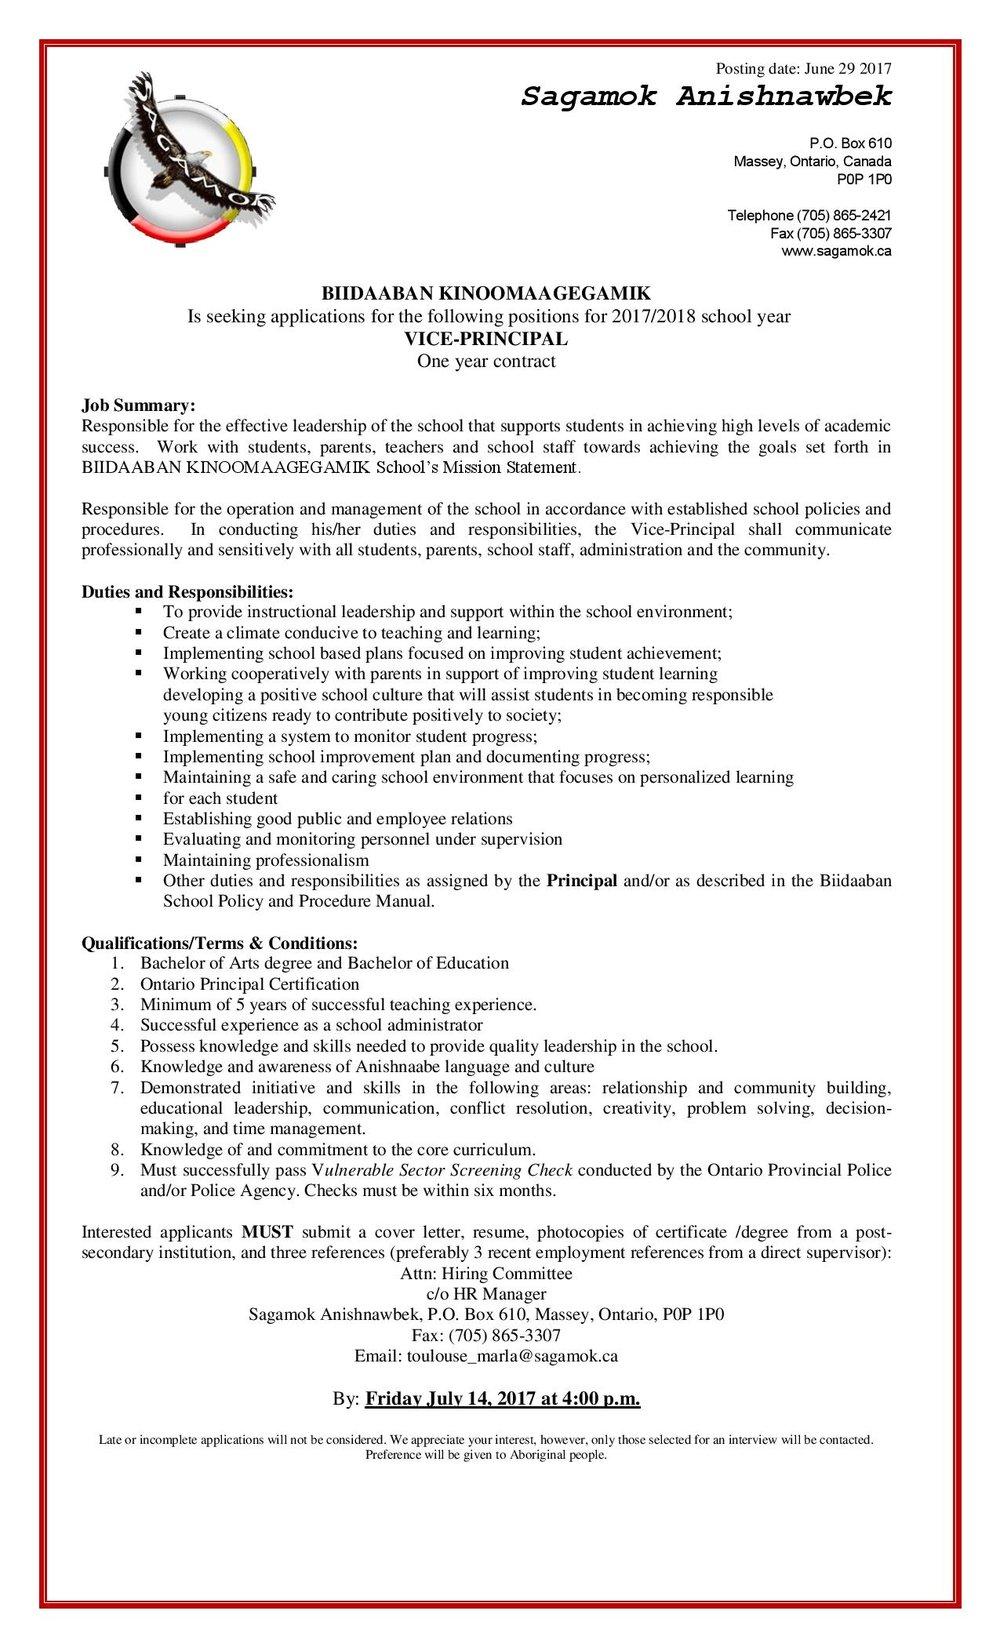 Vice Principal Job Posting